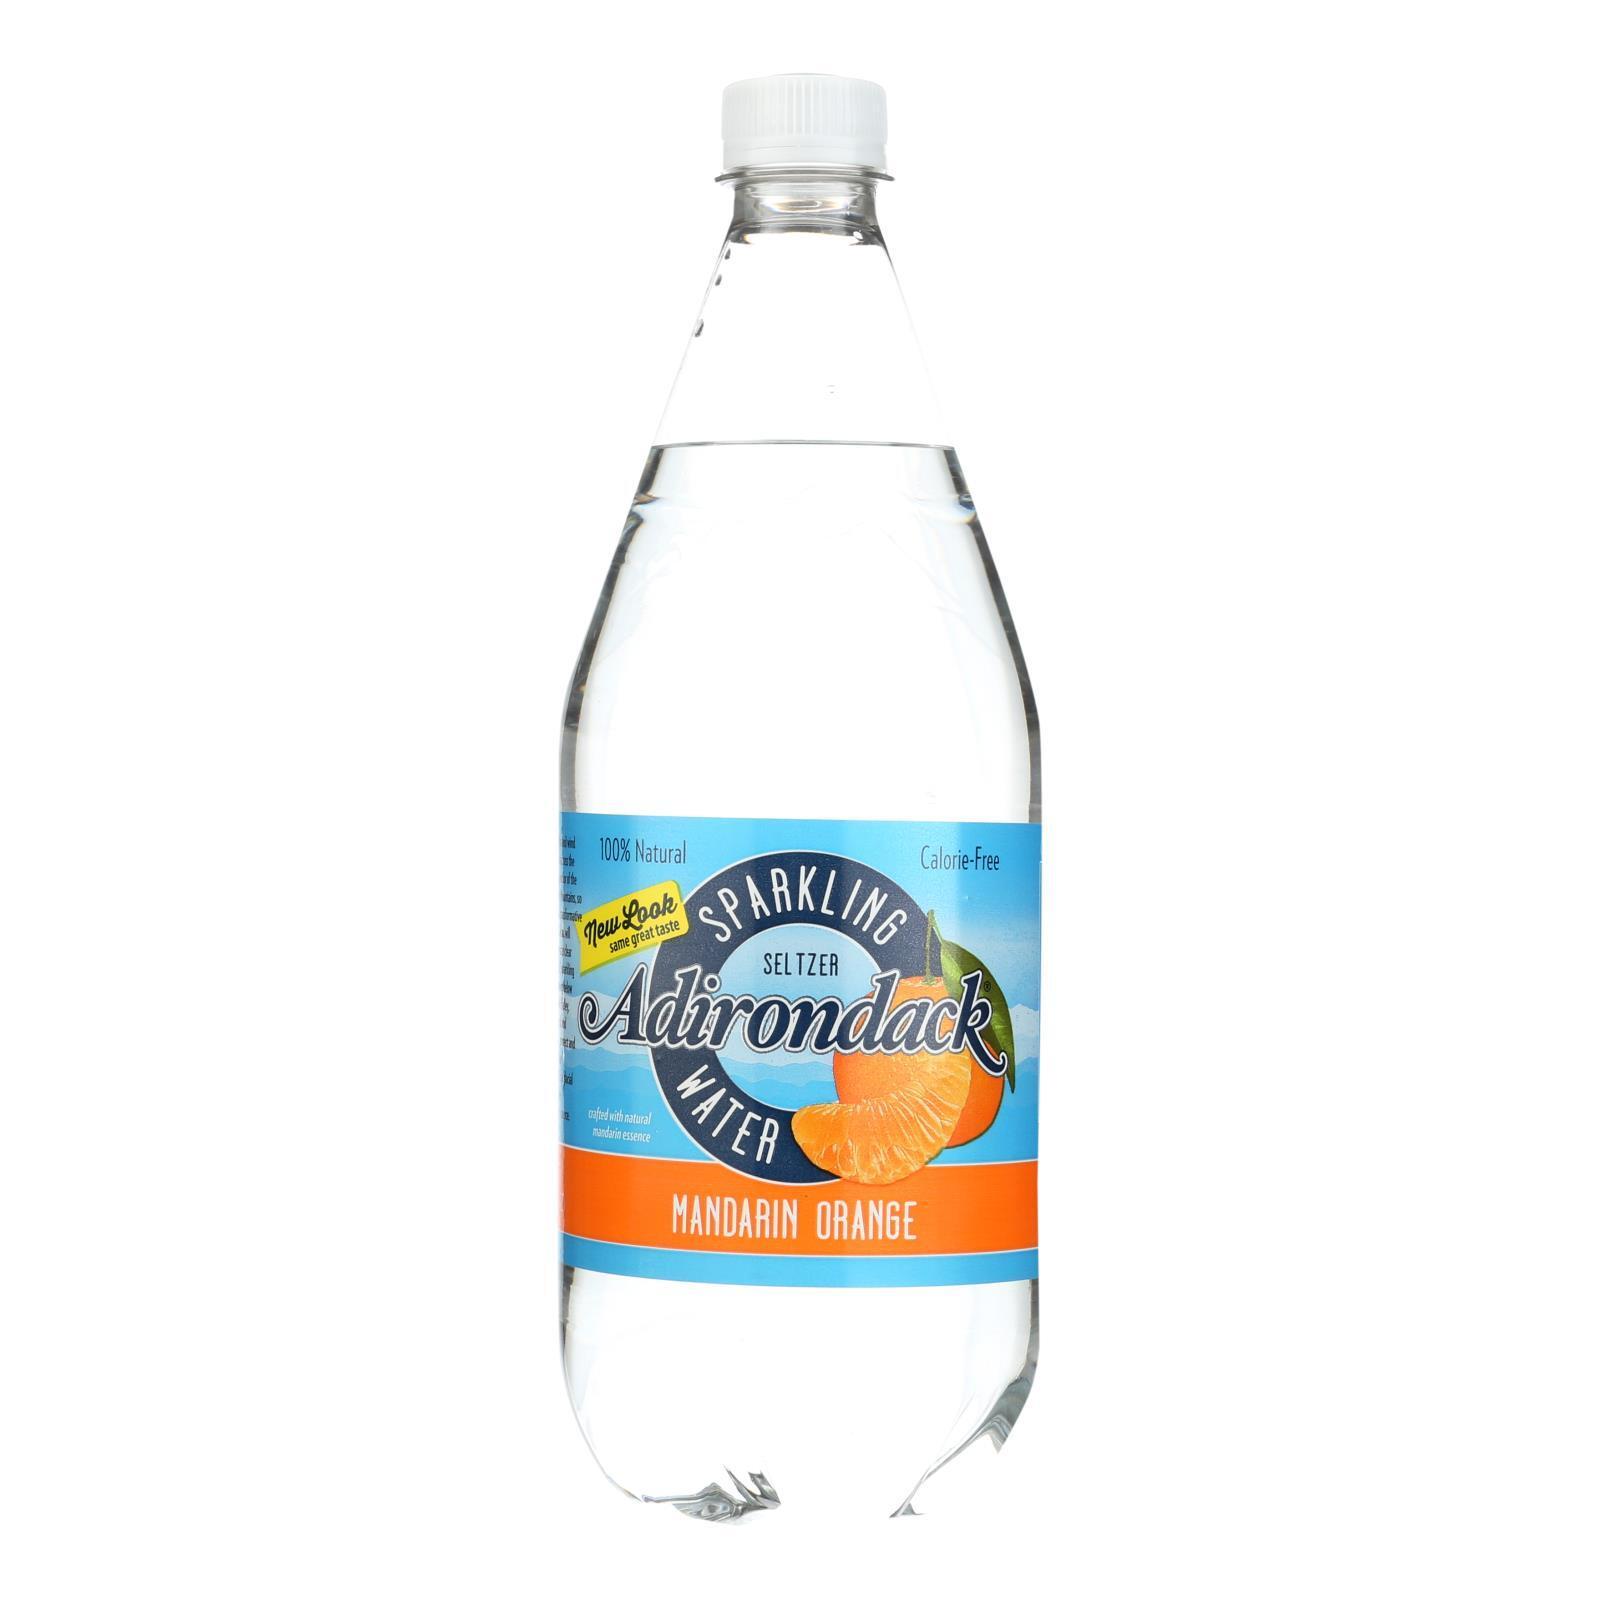 Naturals Adirondack Seltzer - Mandarin Orange - Case of 12 - 33.8 Fl oz.